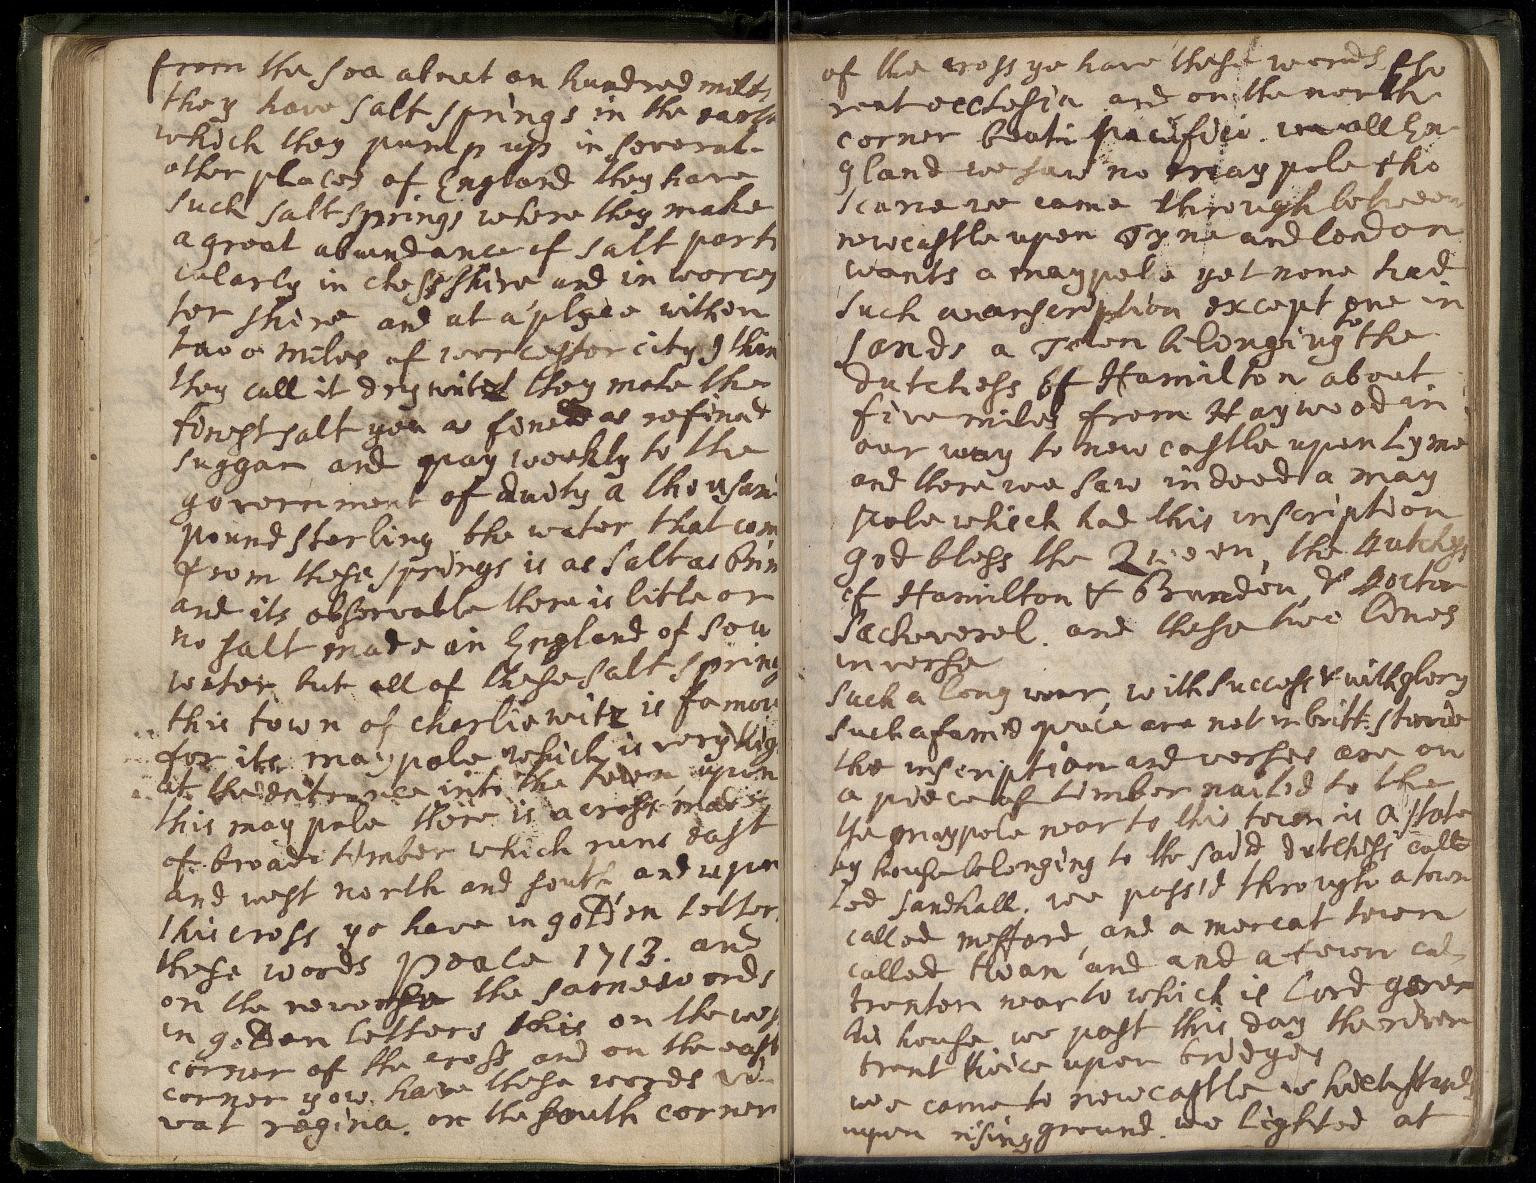 Journal of Mr James Hart, Unpaginated